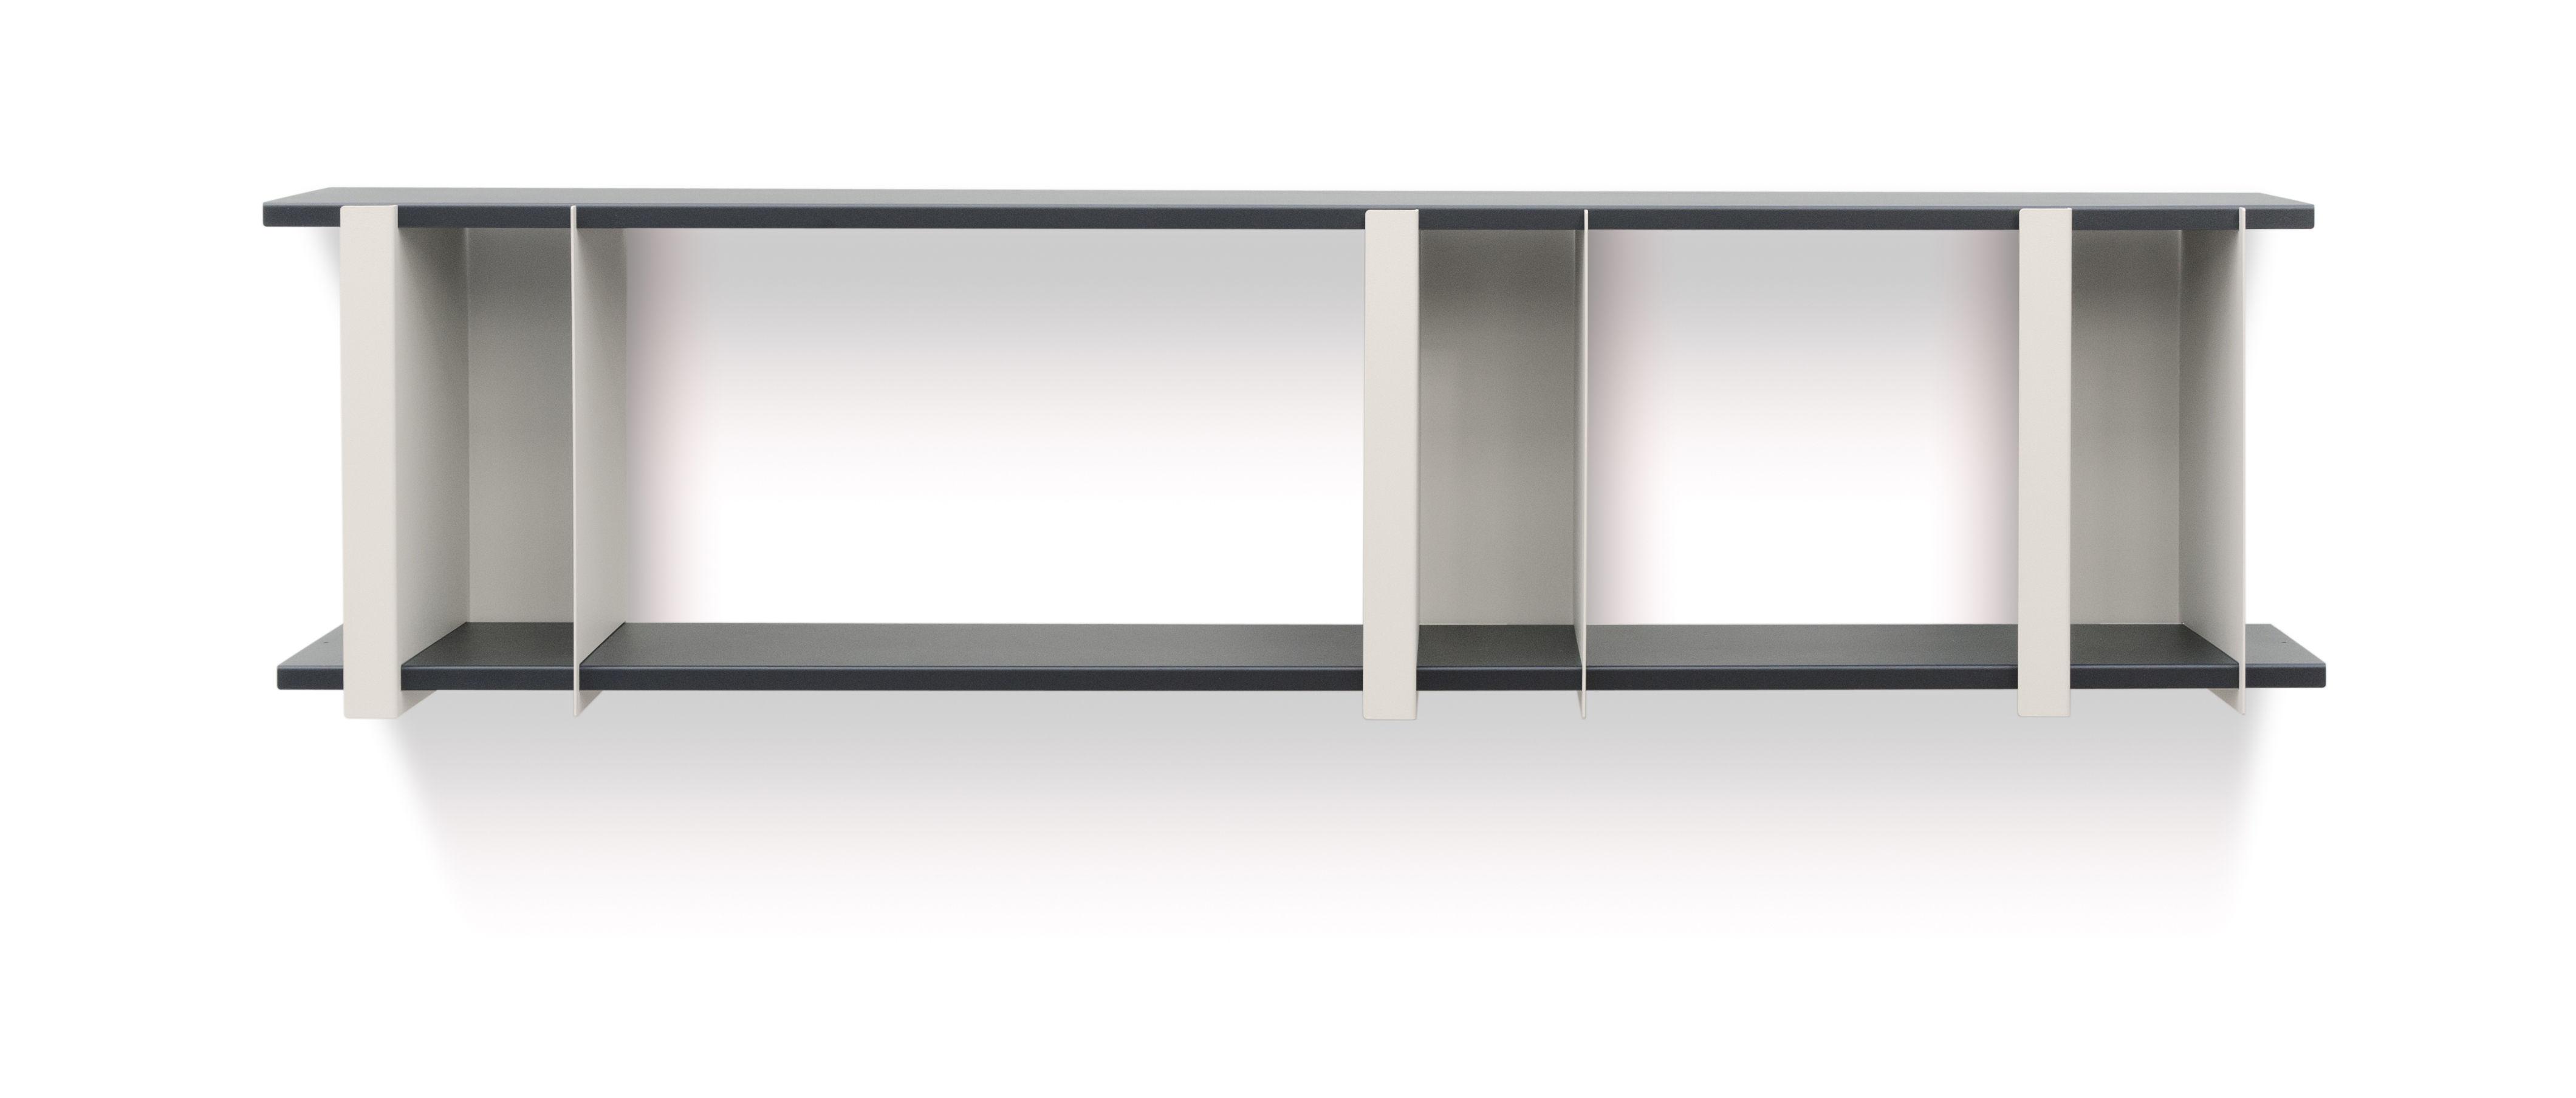 Furniture - Bookcases & Bookshelves - Opli 2 Shelf - / L 149 x H 37 cm by Presse citron - Light beige / Charcoal - Lacquered steel